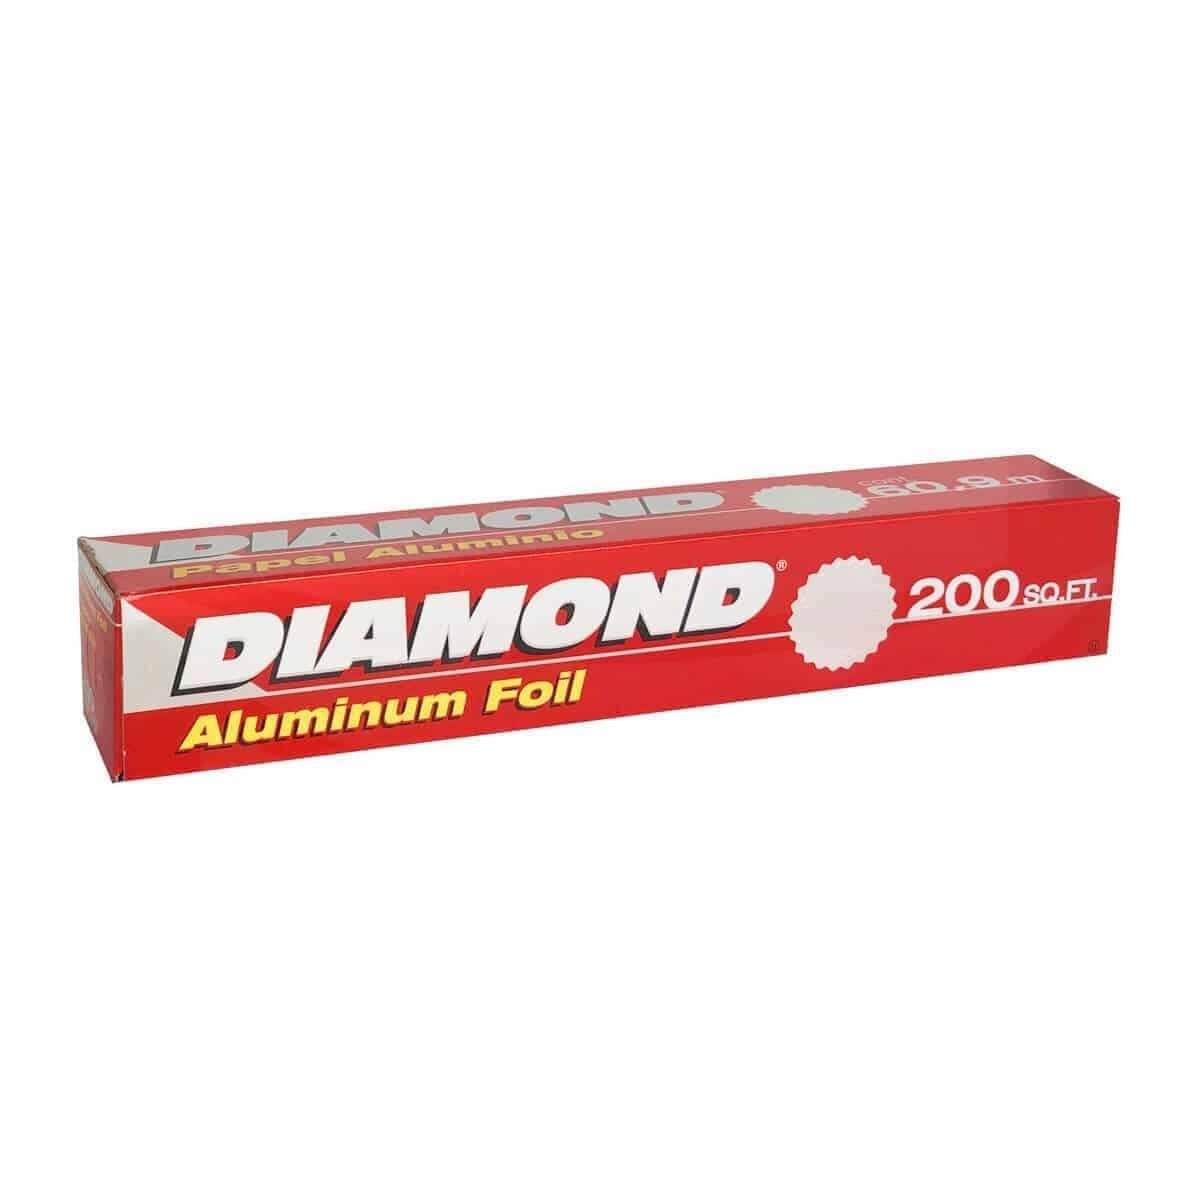 Papel Aluminio Diamond Foil 200 Ft- S